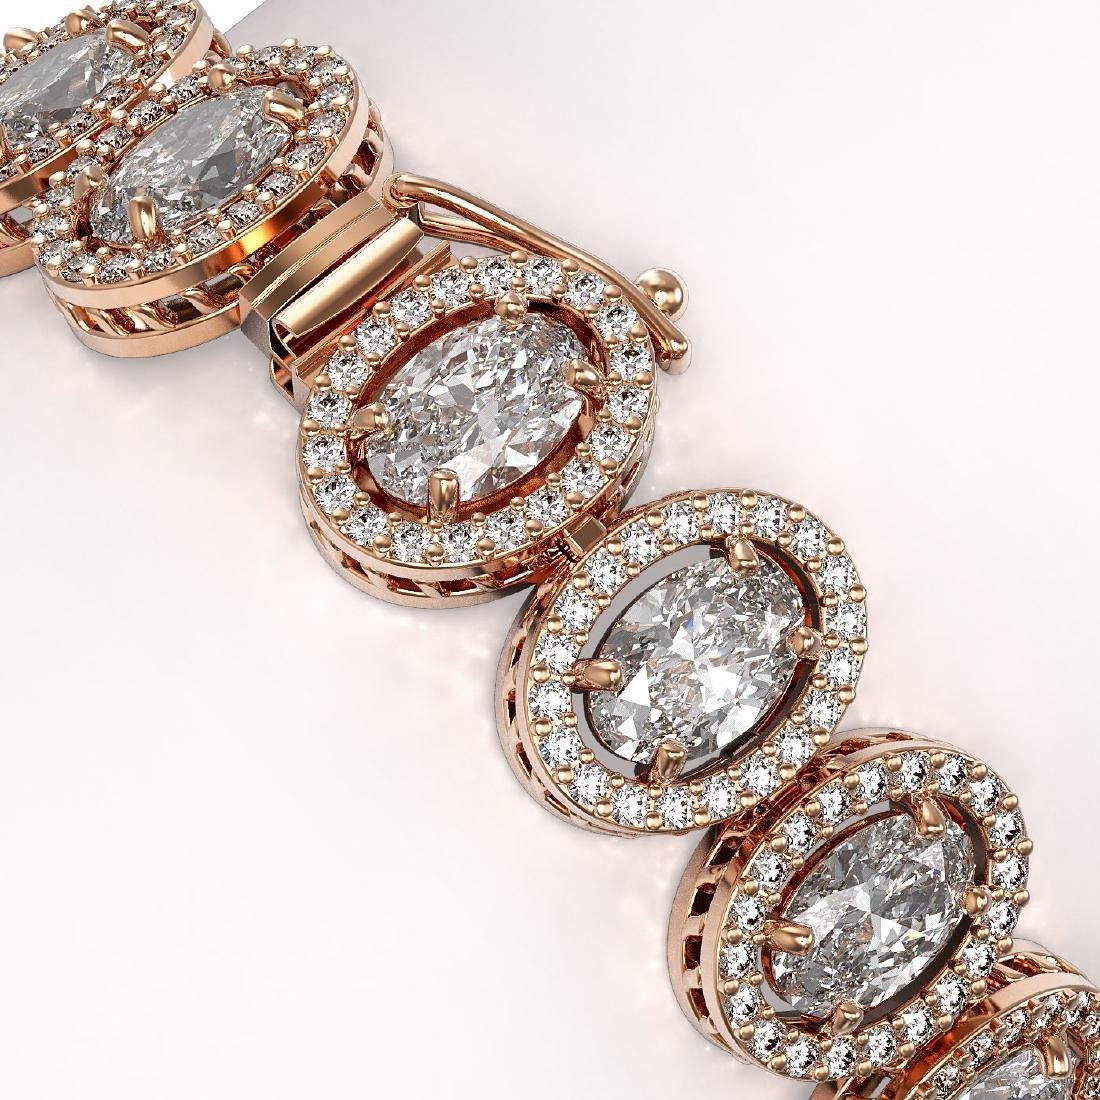 18.8 CTW Oval Diamond Designer Bracelet 18K Rose Gold - 3